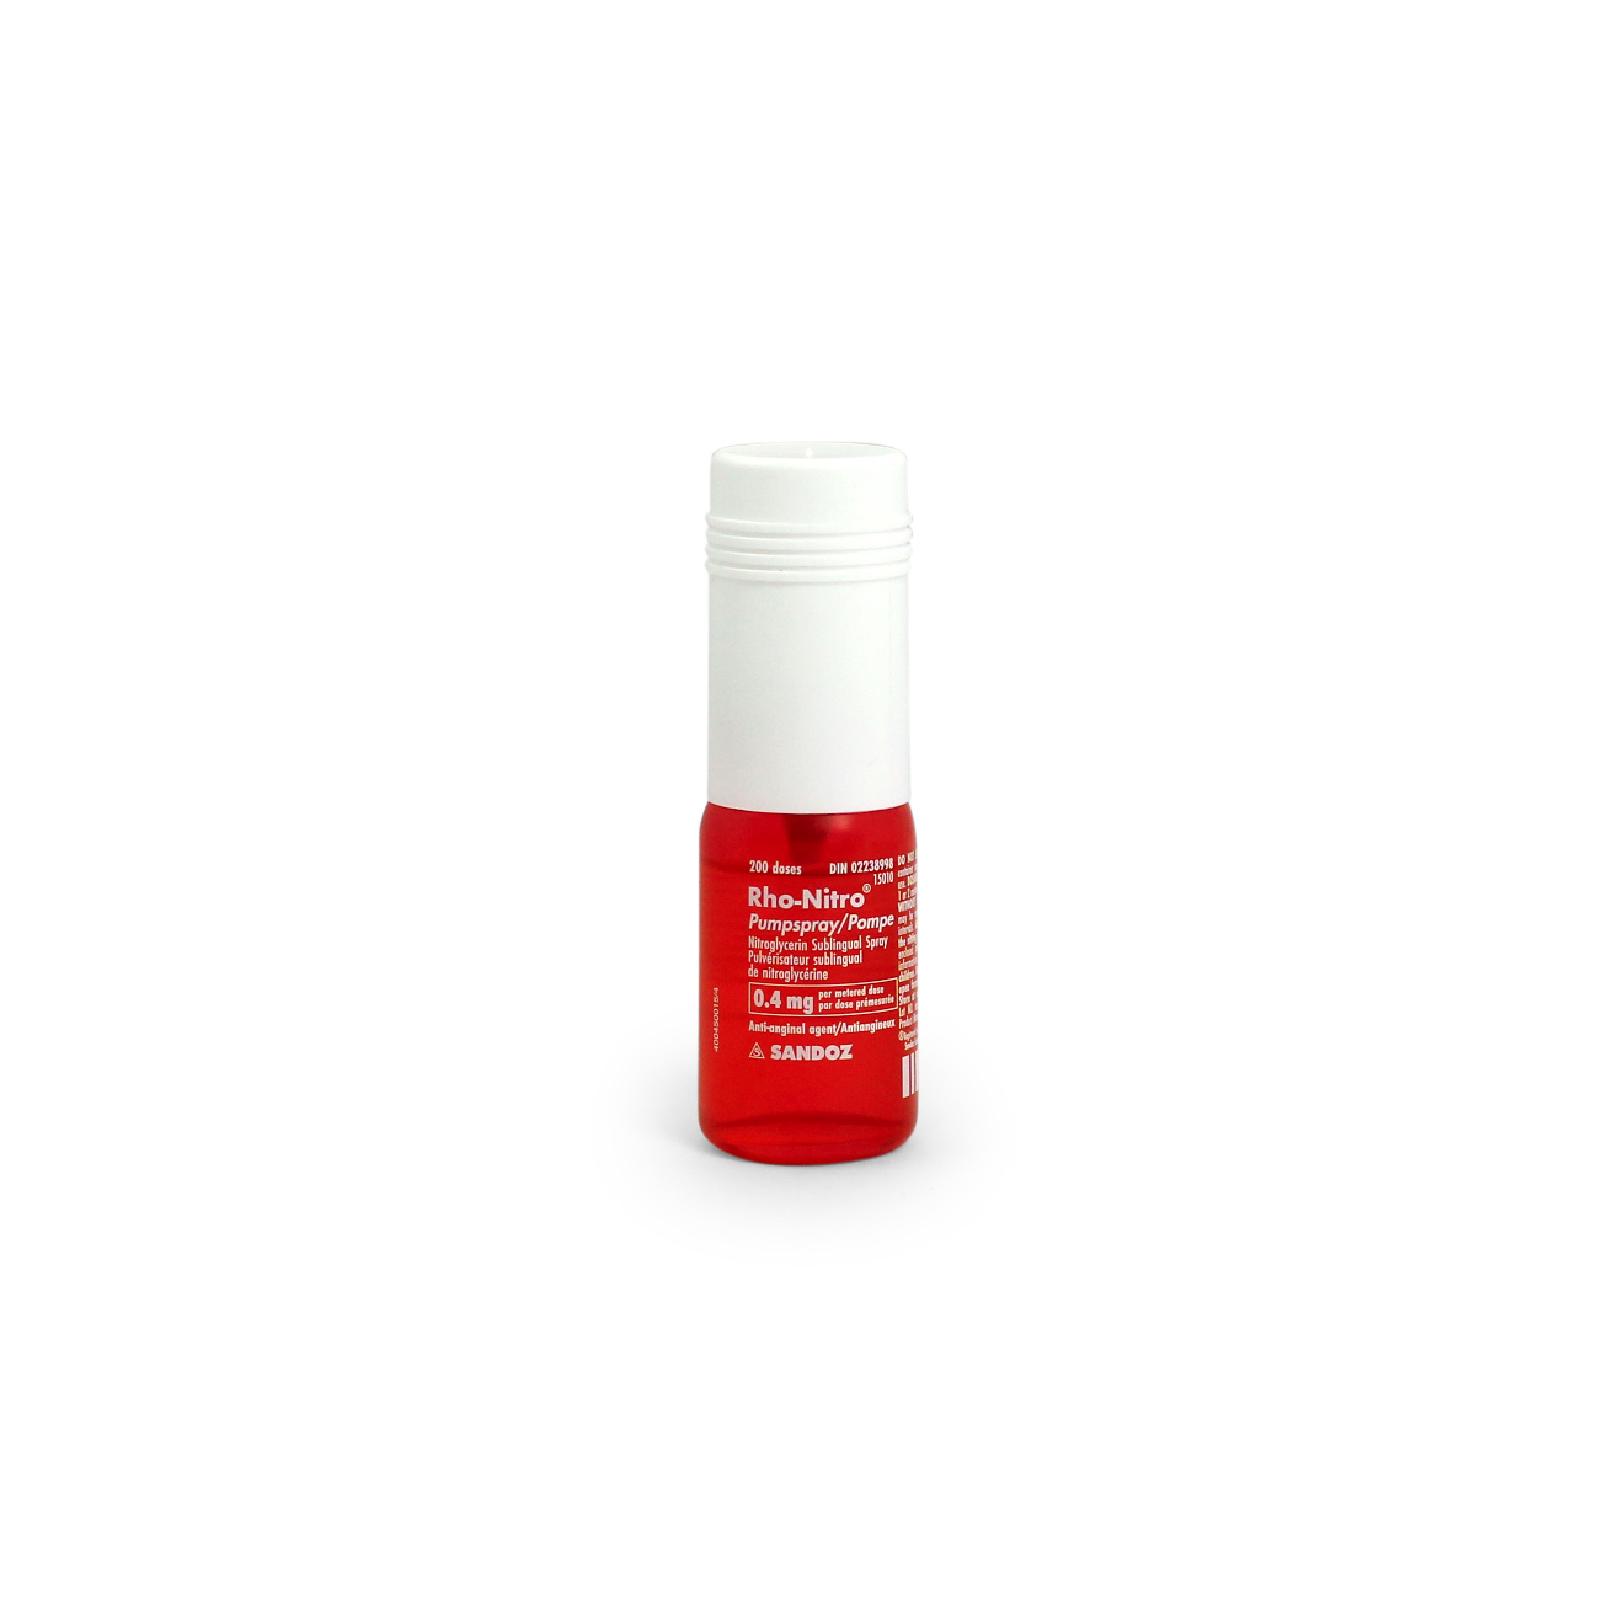 Picture of LIGHTHOUSE™ RHO-NITRO ® PUMPSPRAY (Nitroglycerin) 0.4mg, 1 U/Bx